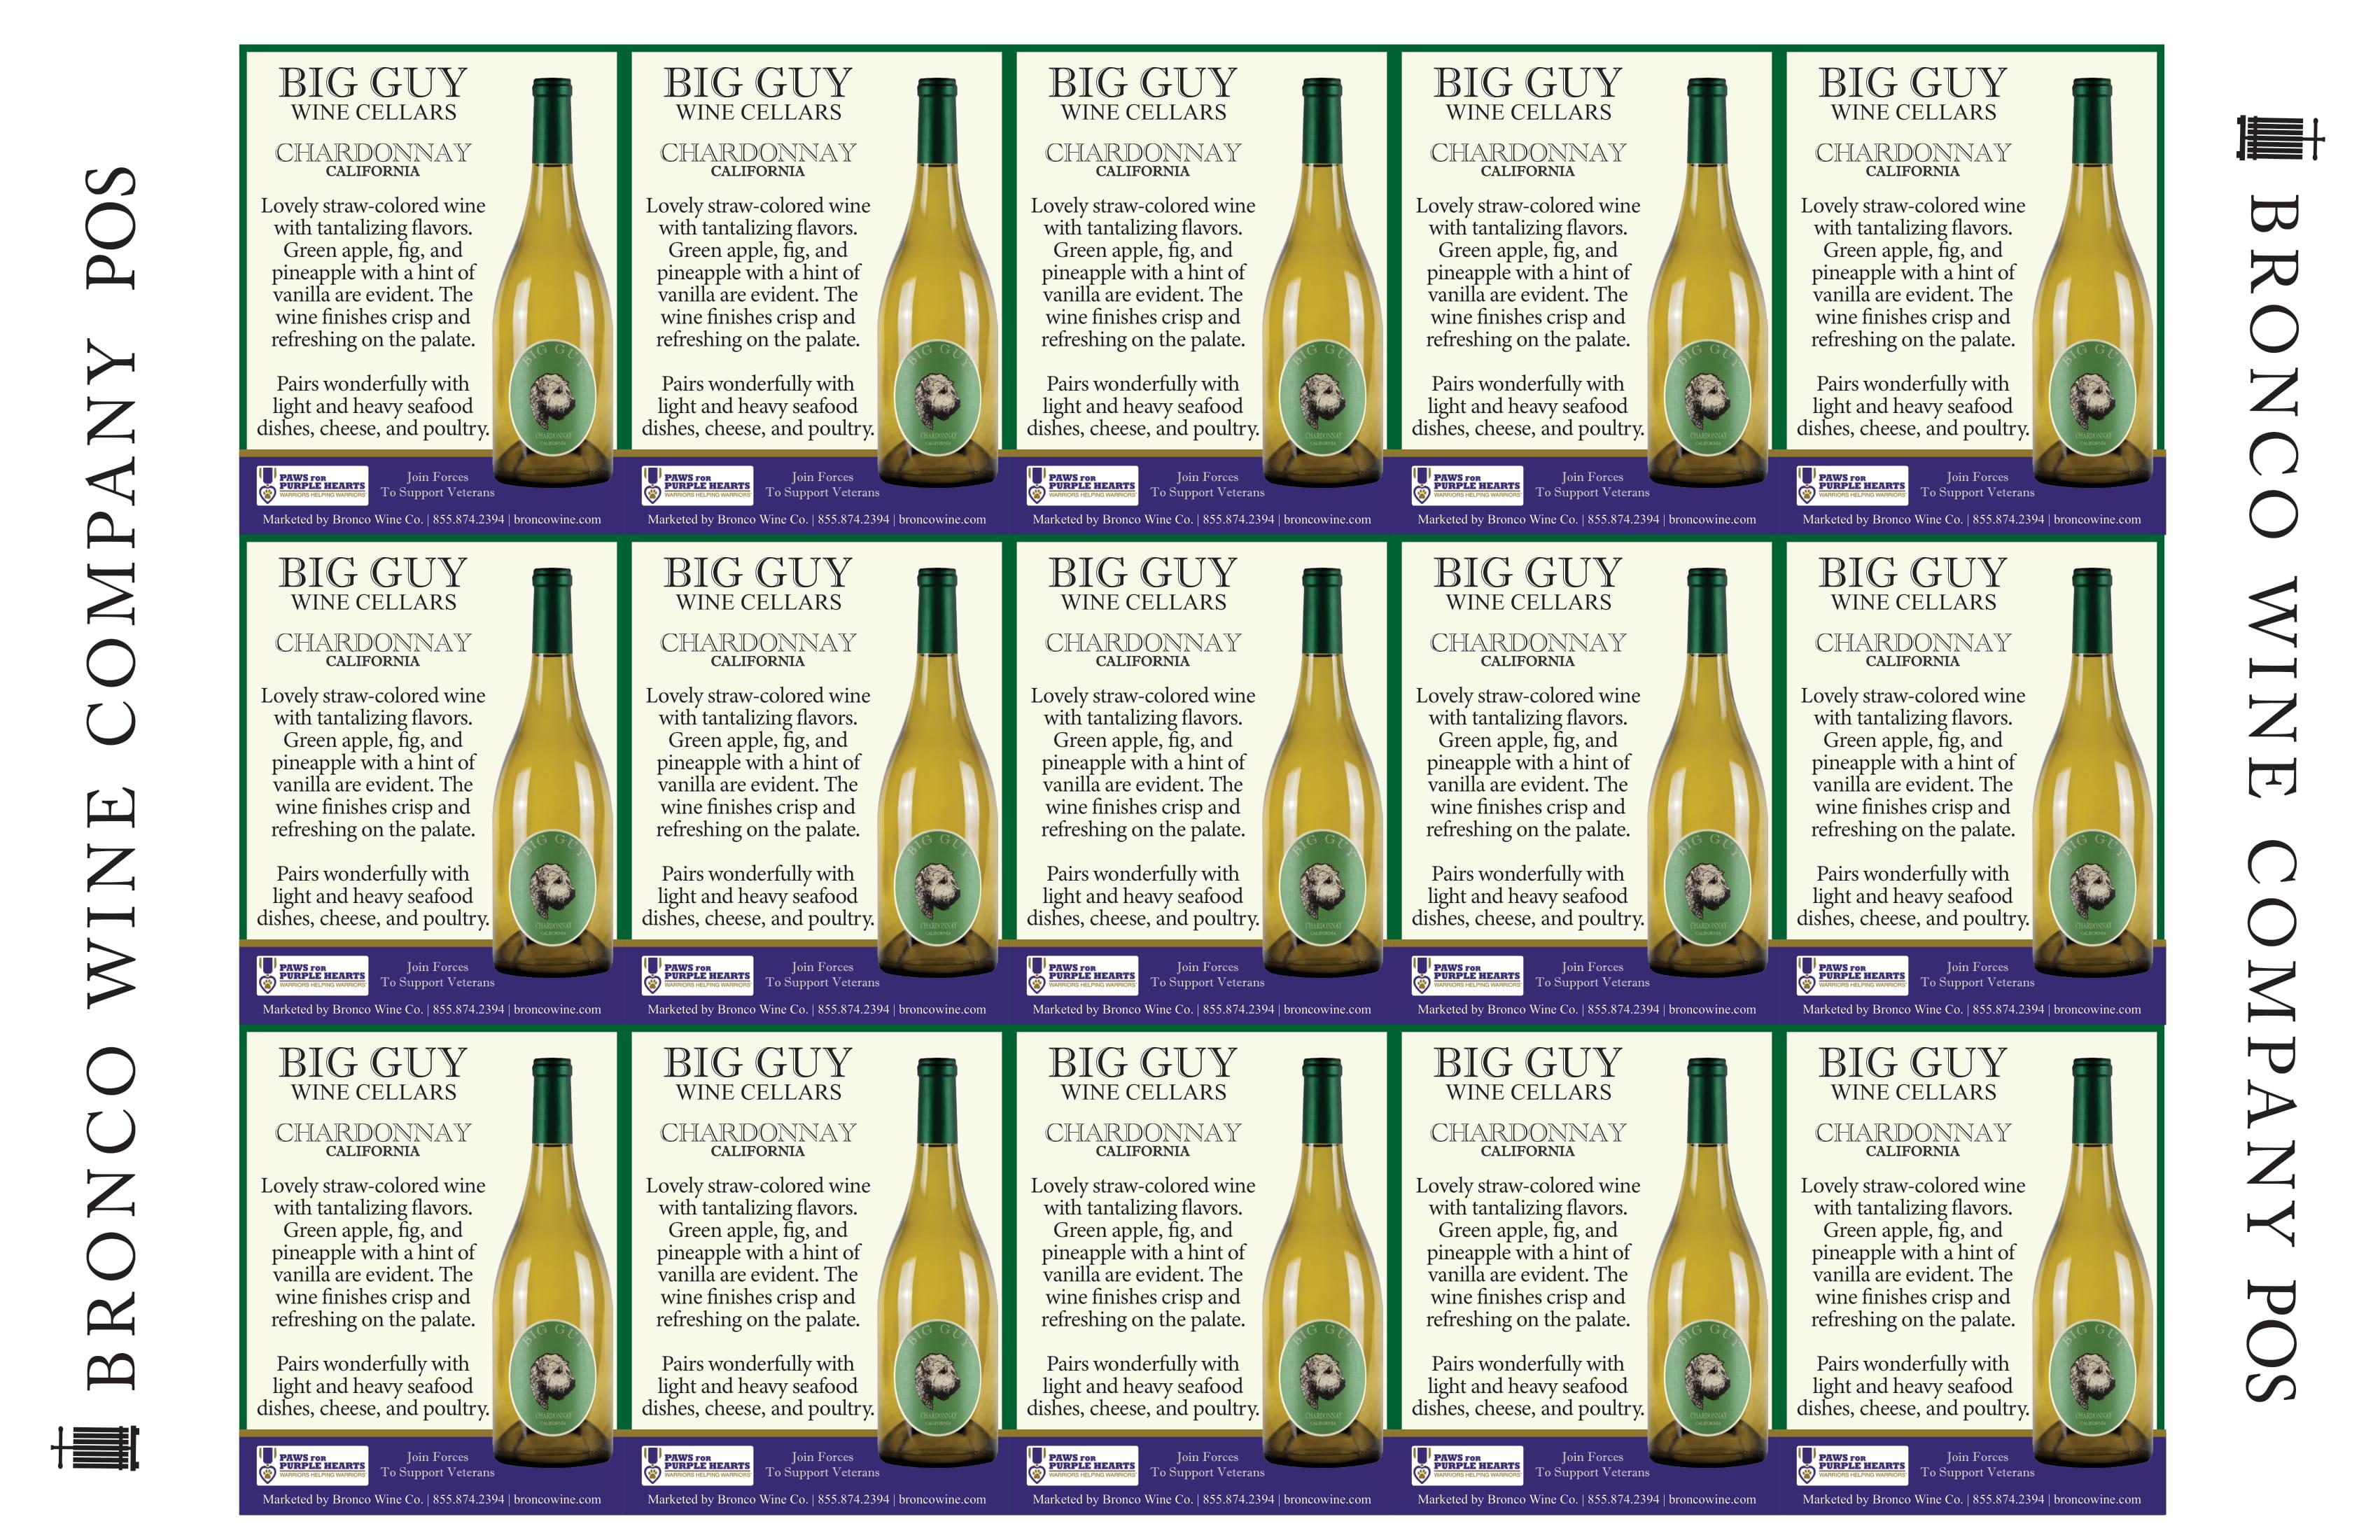 Big Guy Chardonnay Shelf-Talkers